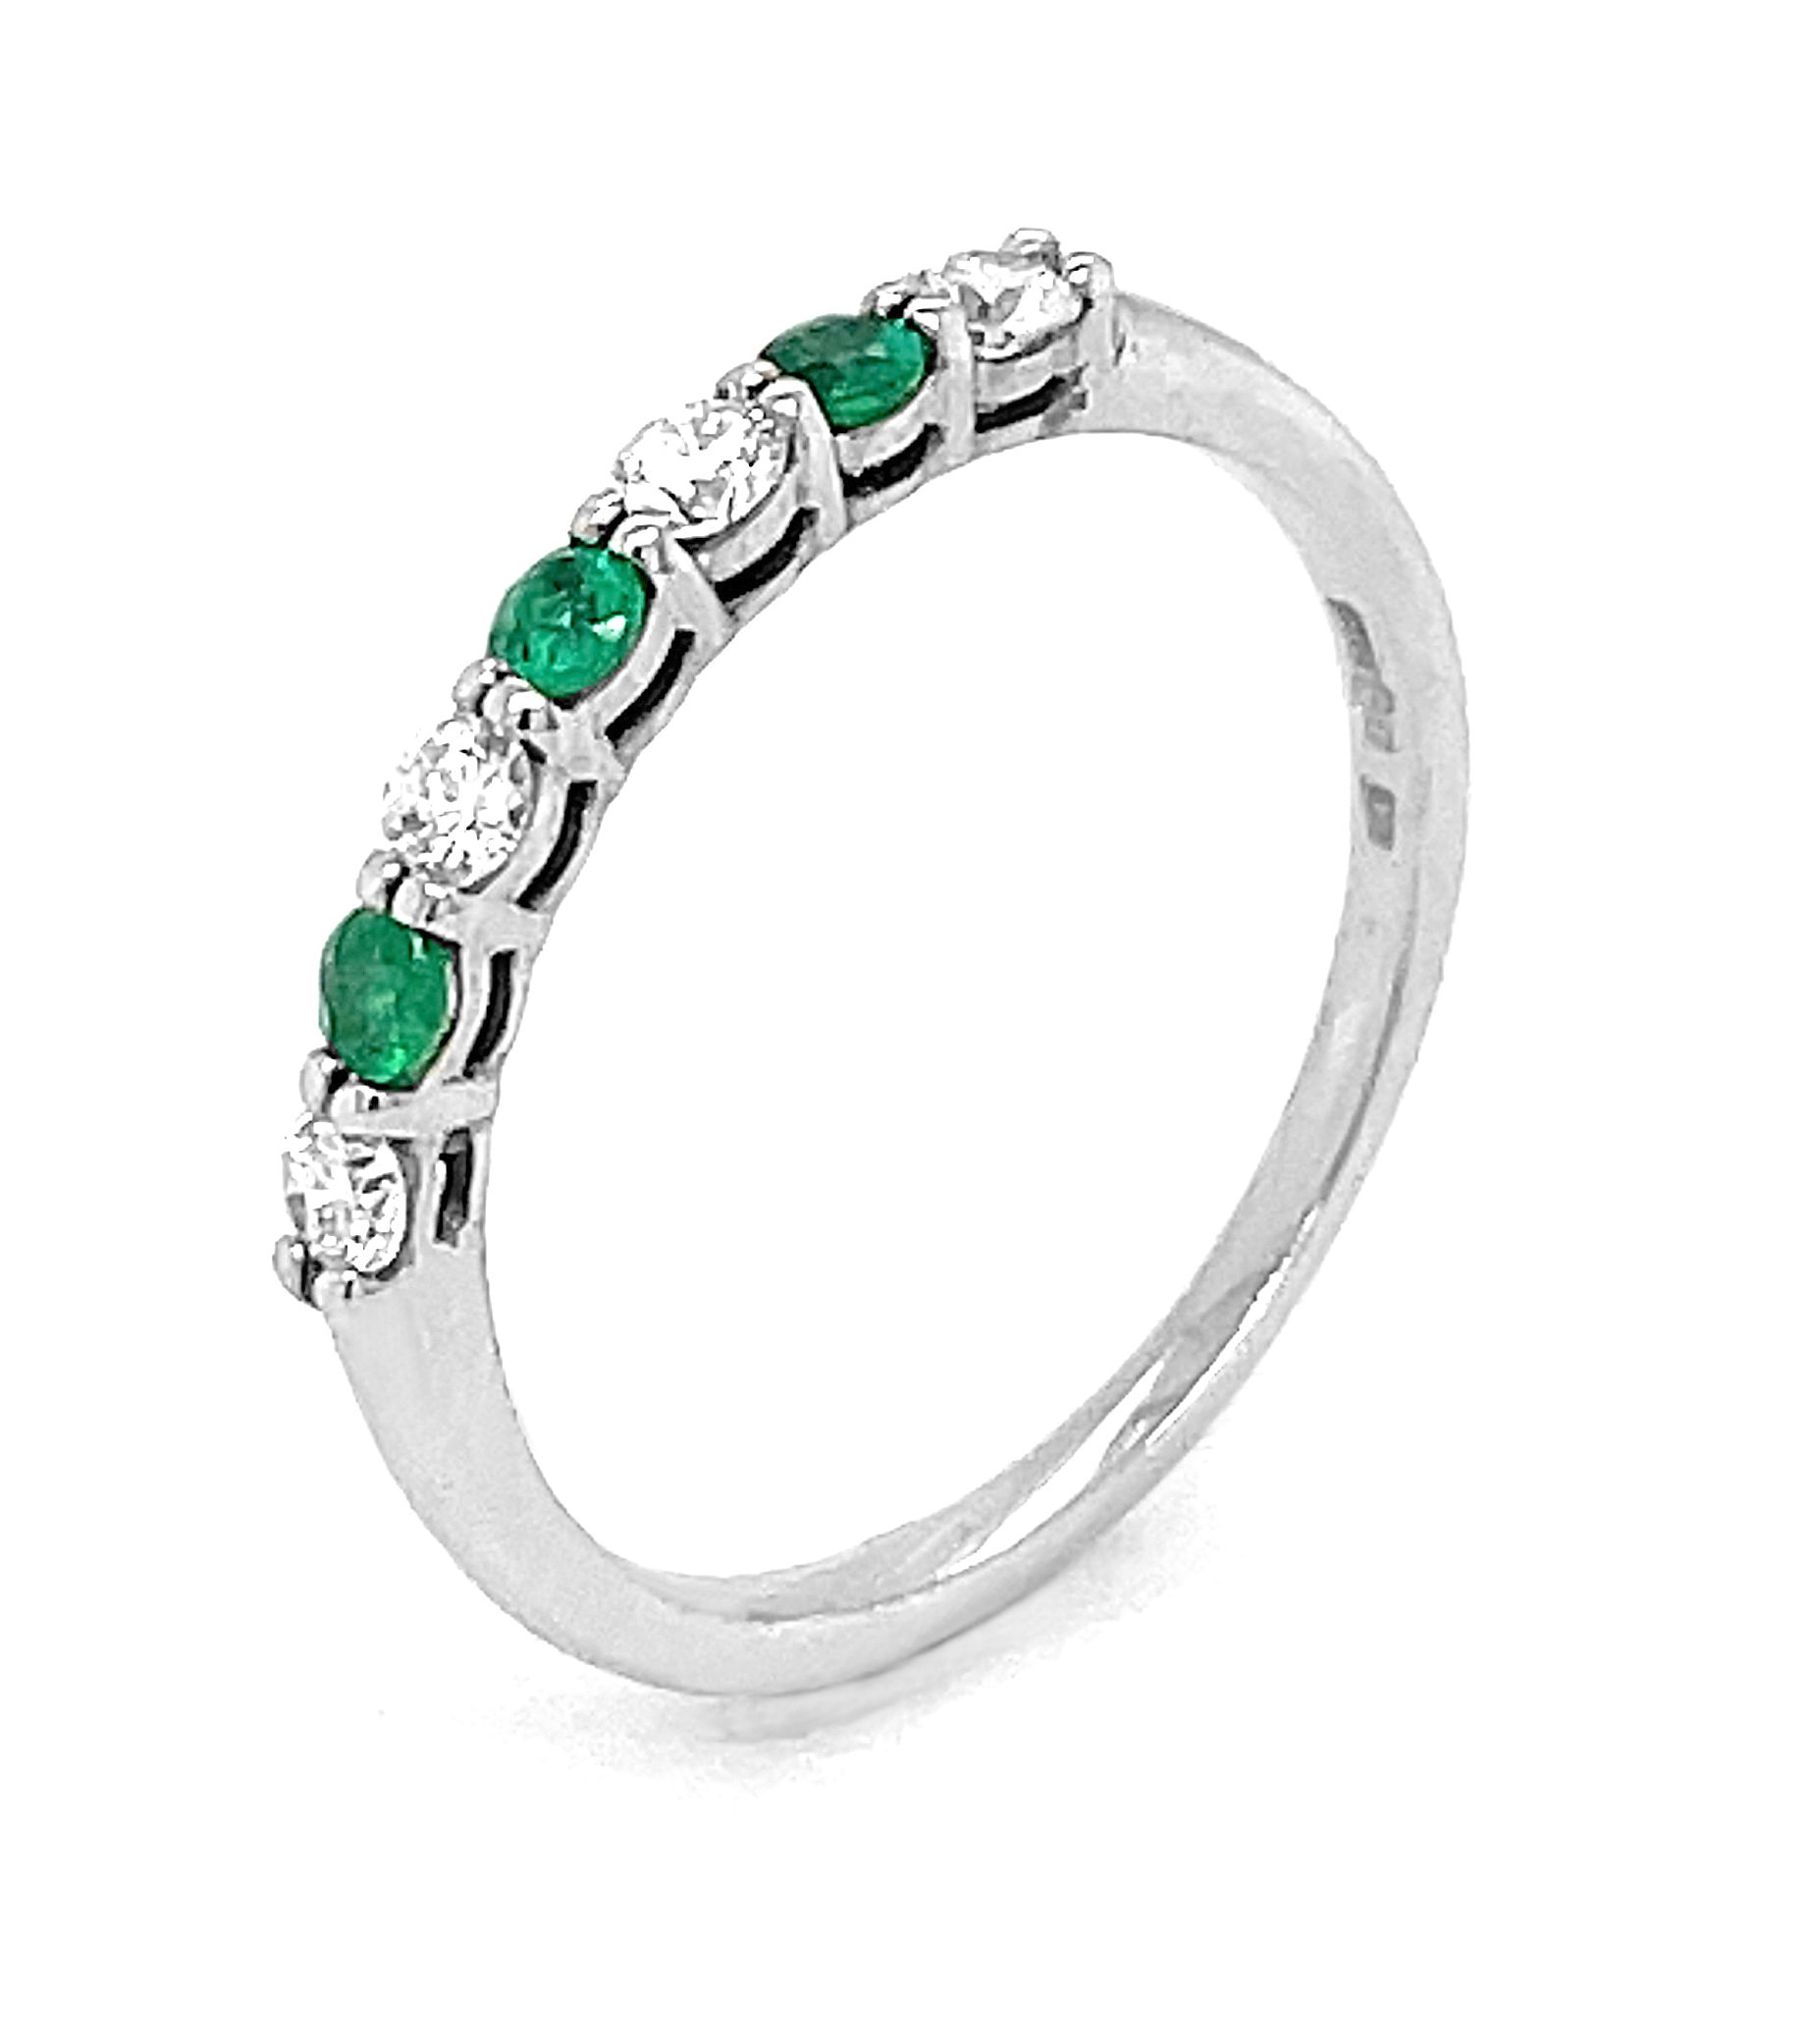 18k White Gold 7st Round Emerald & Brilliant Cut Diamond Eternity Ring